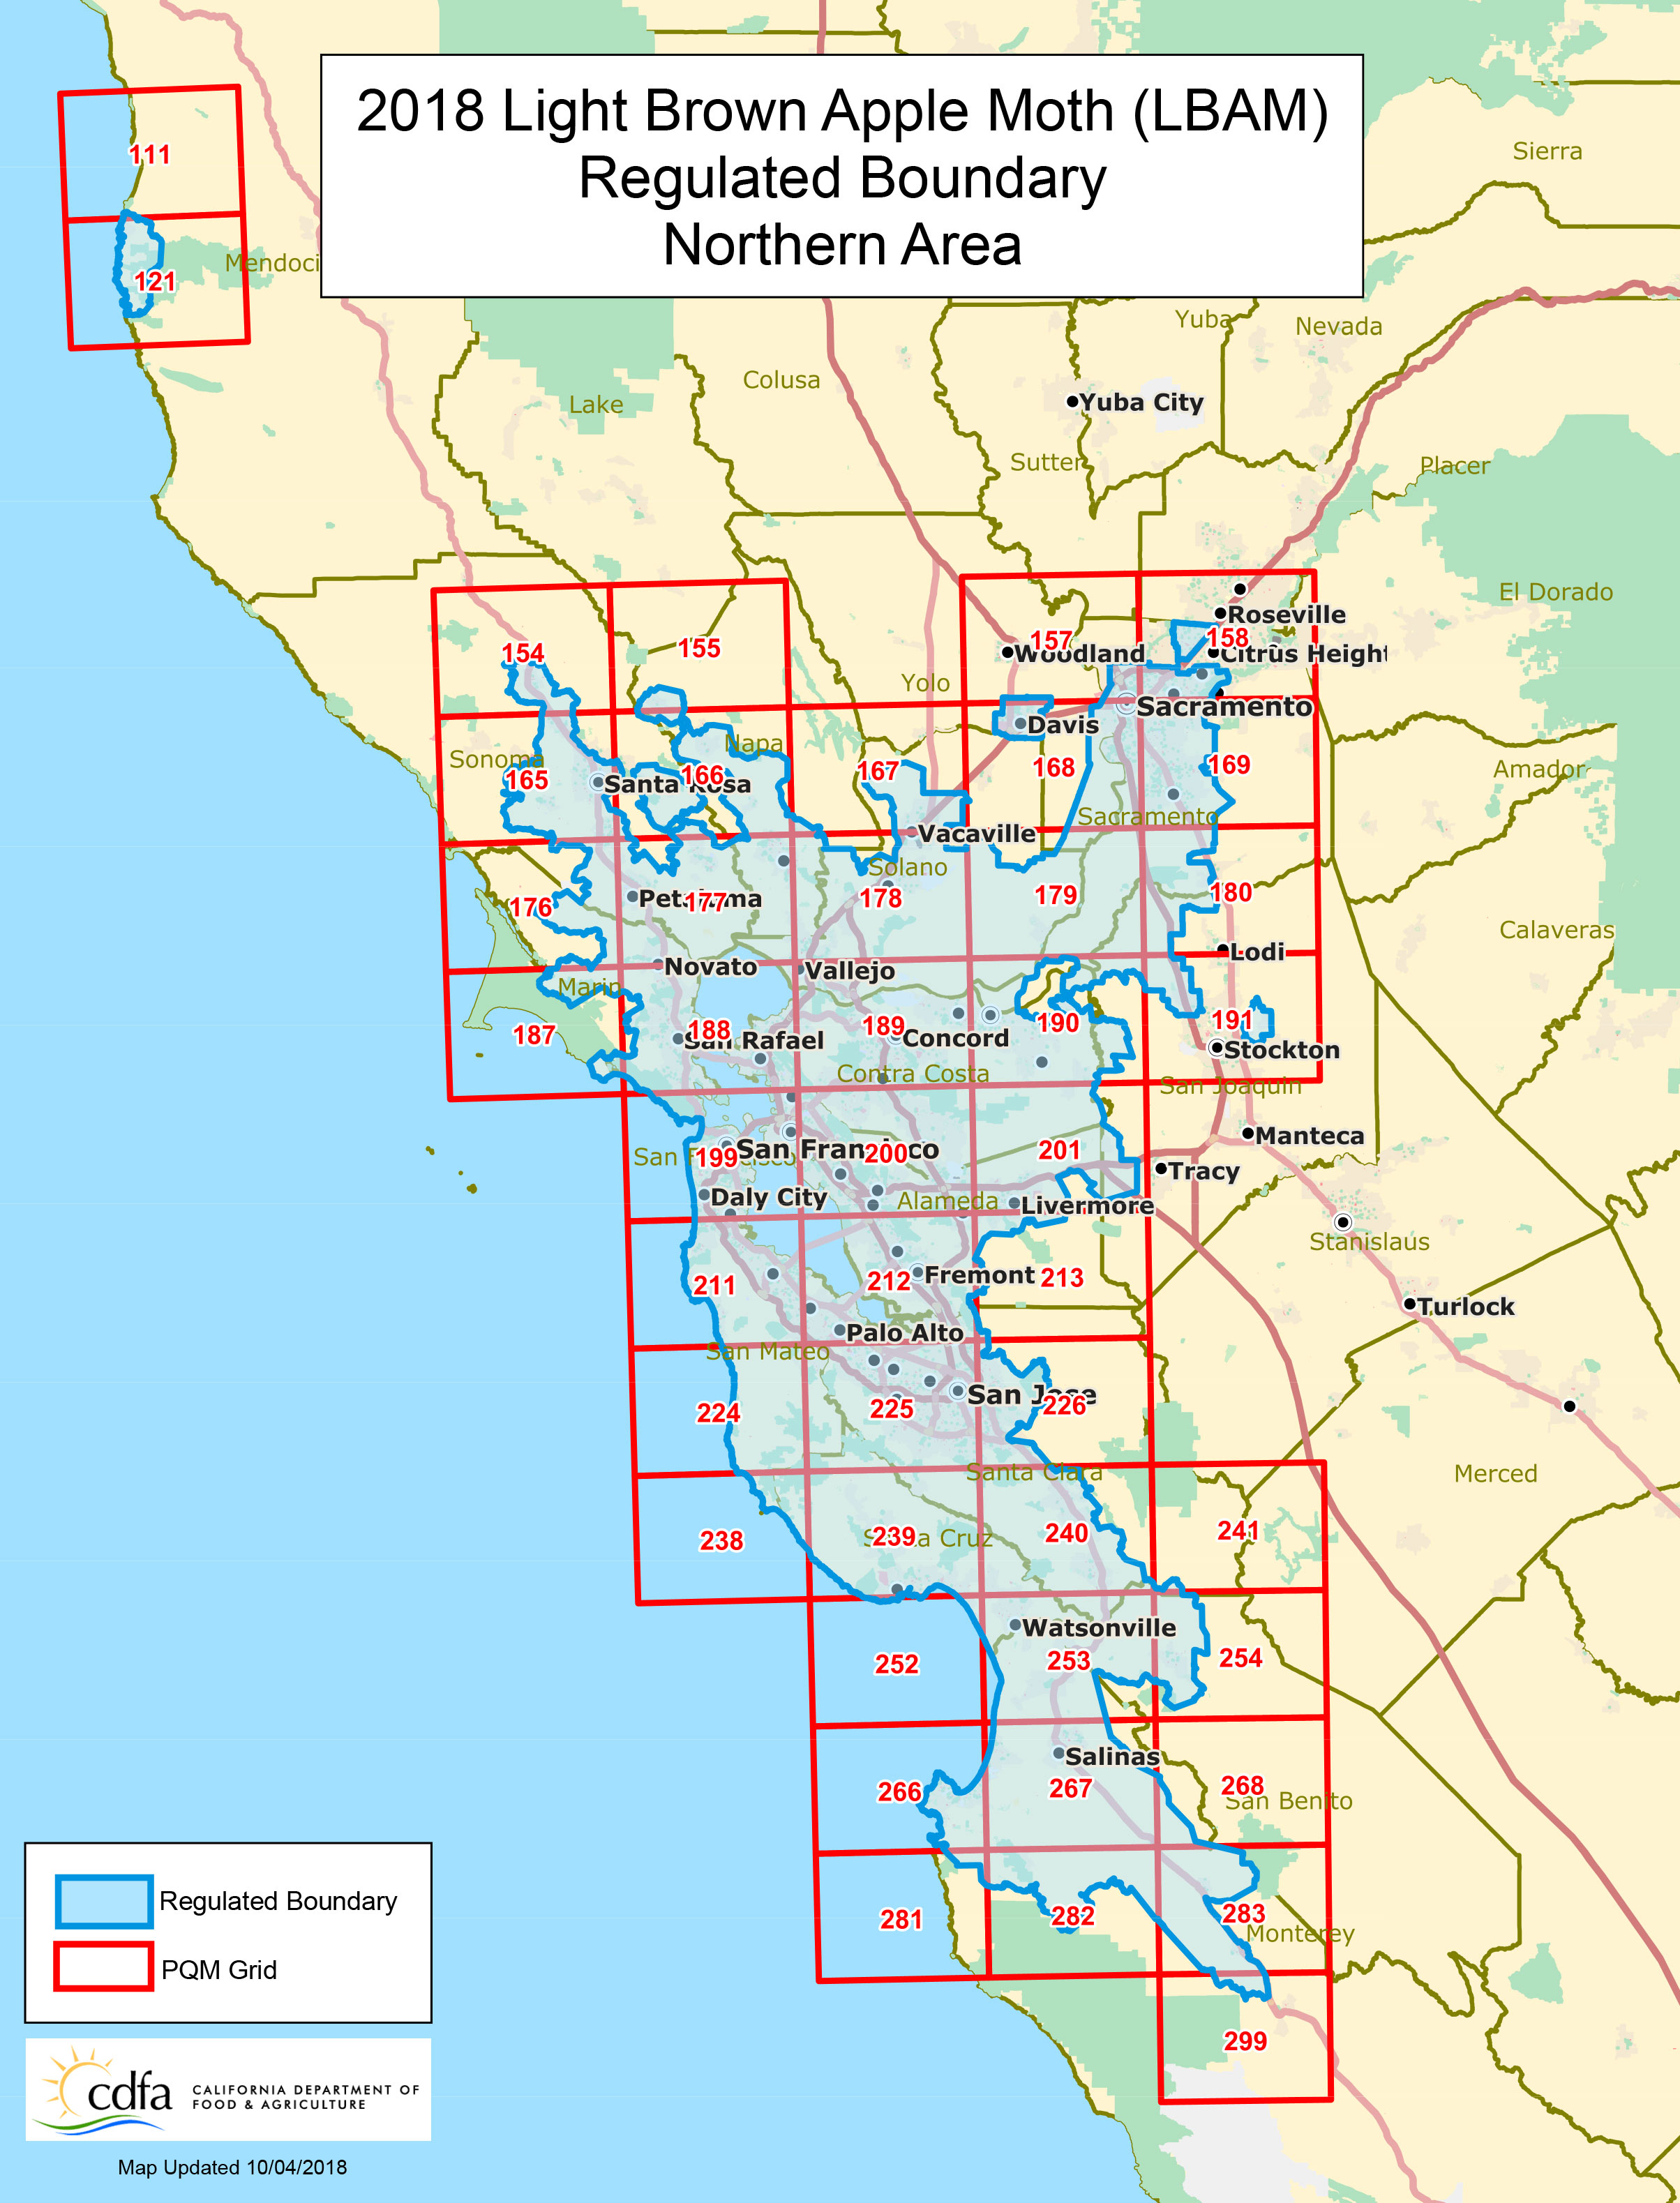 Light Brown Apple Moth Regulation And Quarantine Boundary Maps - California 511 Map